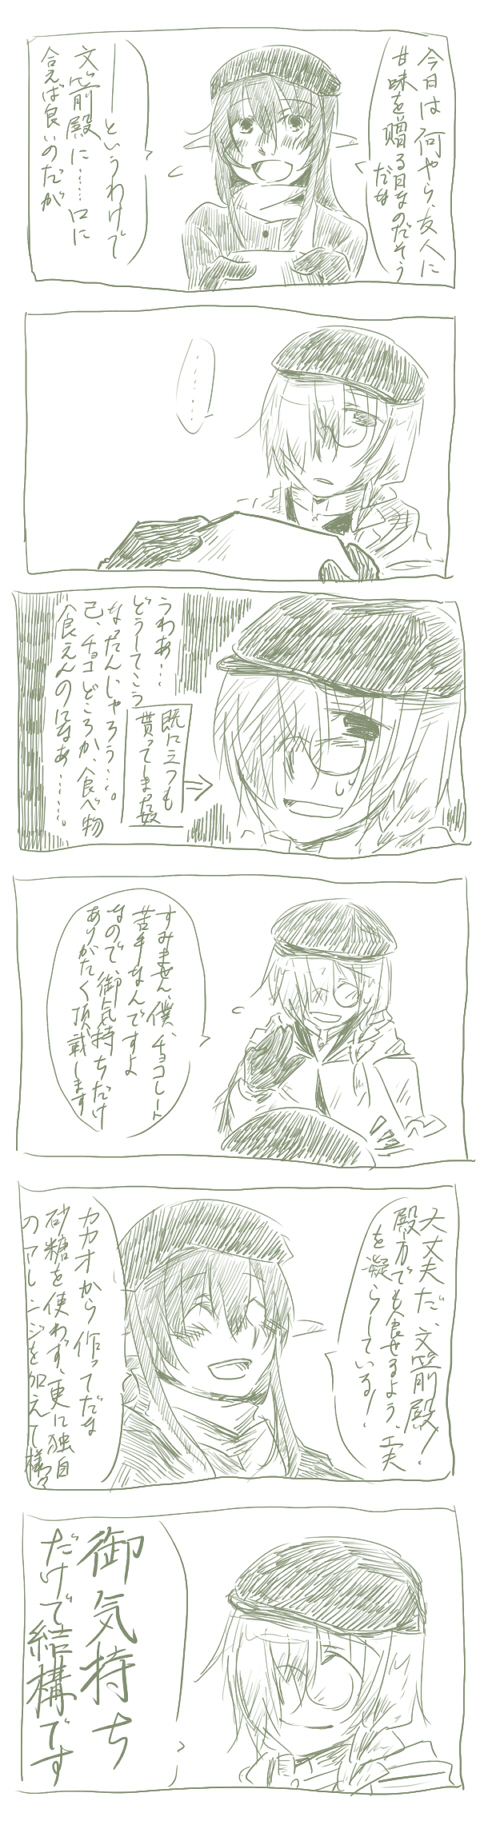 bunya-ririko-vale-manga.jpg